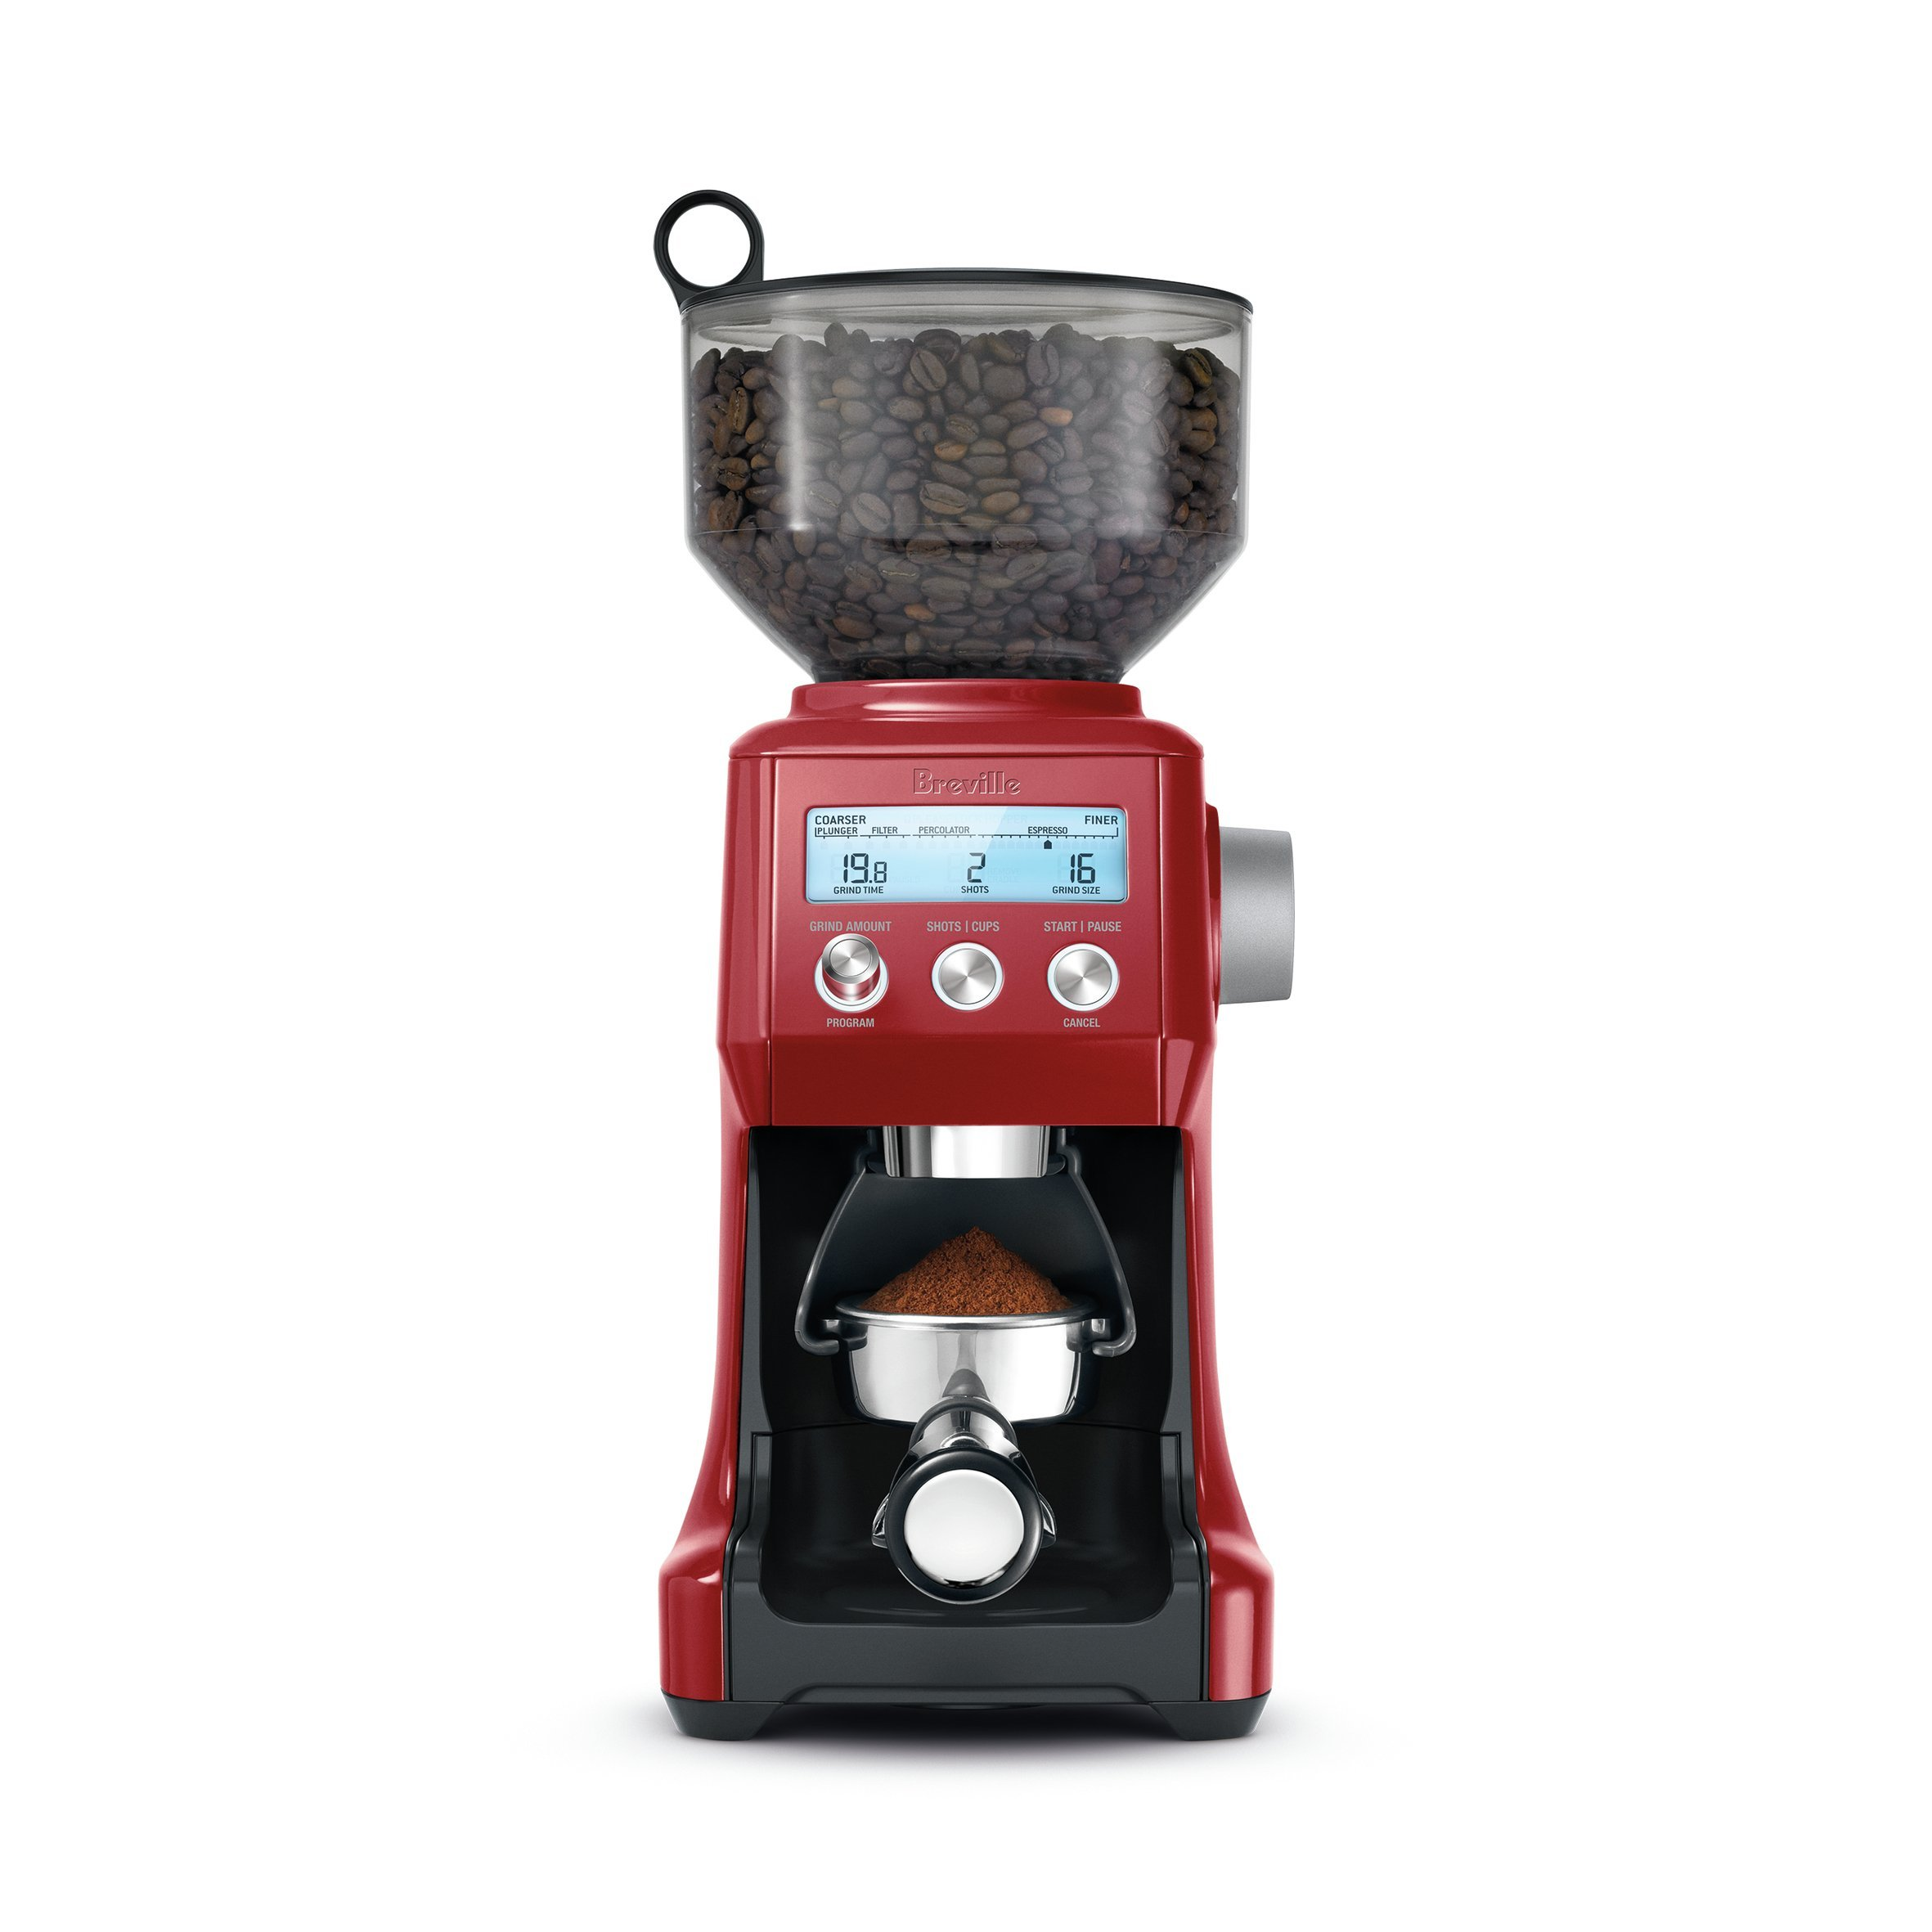 Breville BCG820BCRNXL The Smart Grinder Pro Coffee Bean Grinder, Cranberry Red (Renewed)